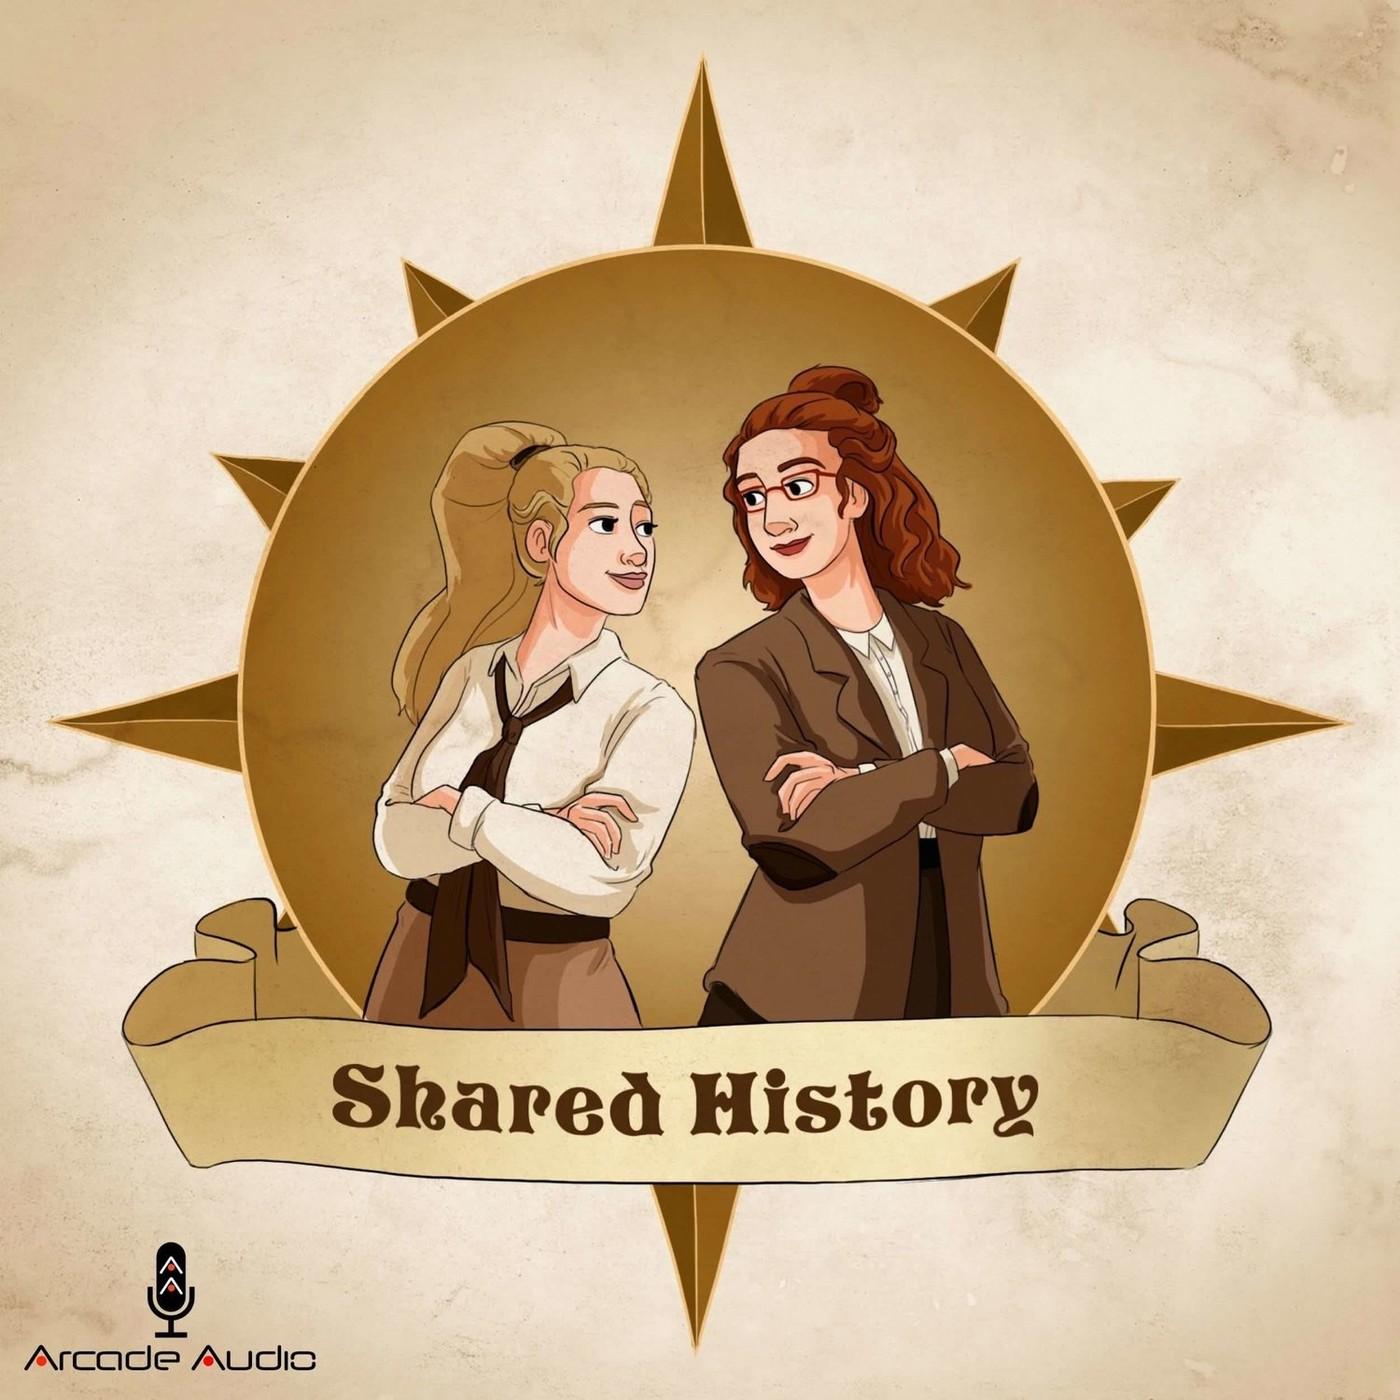 035 - History Uncorked (feat. Patrick Serrano)